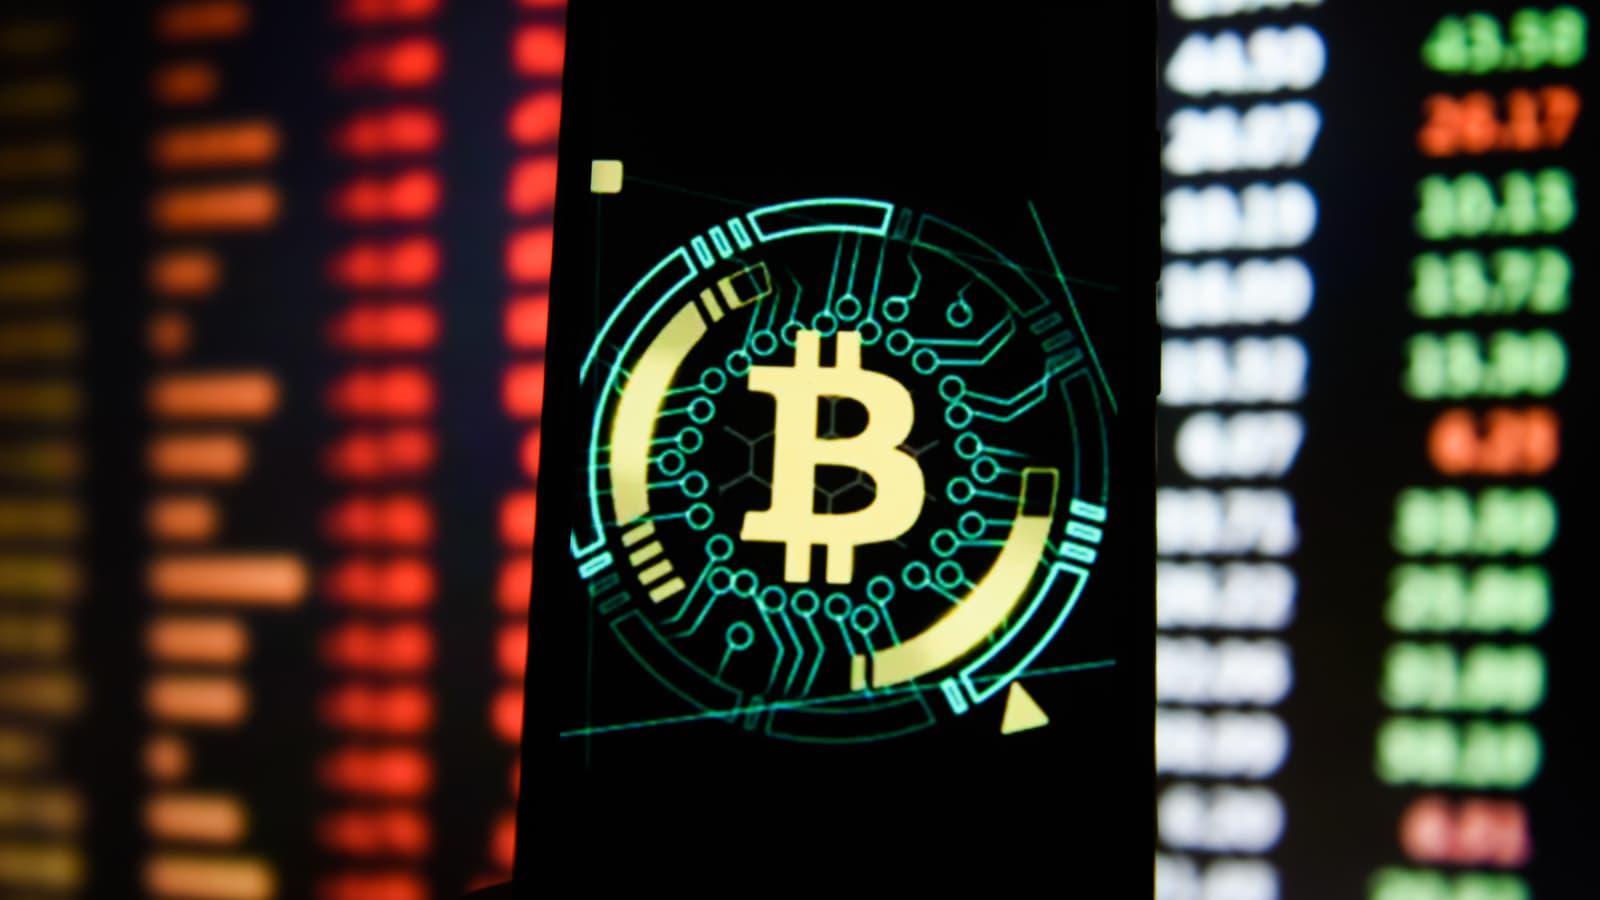 wall street journal stop talking bitcoin market cap